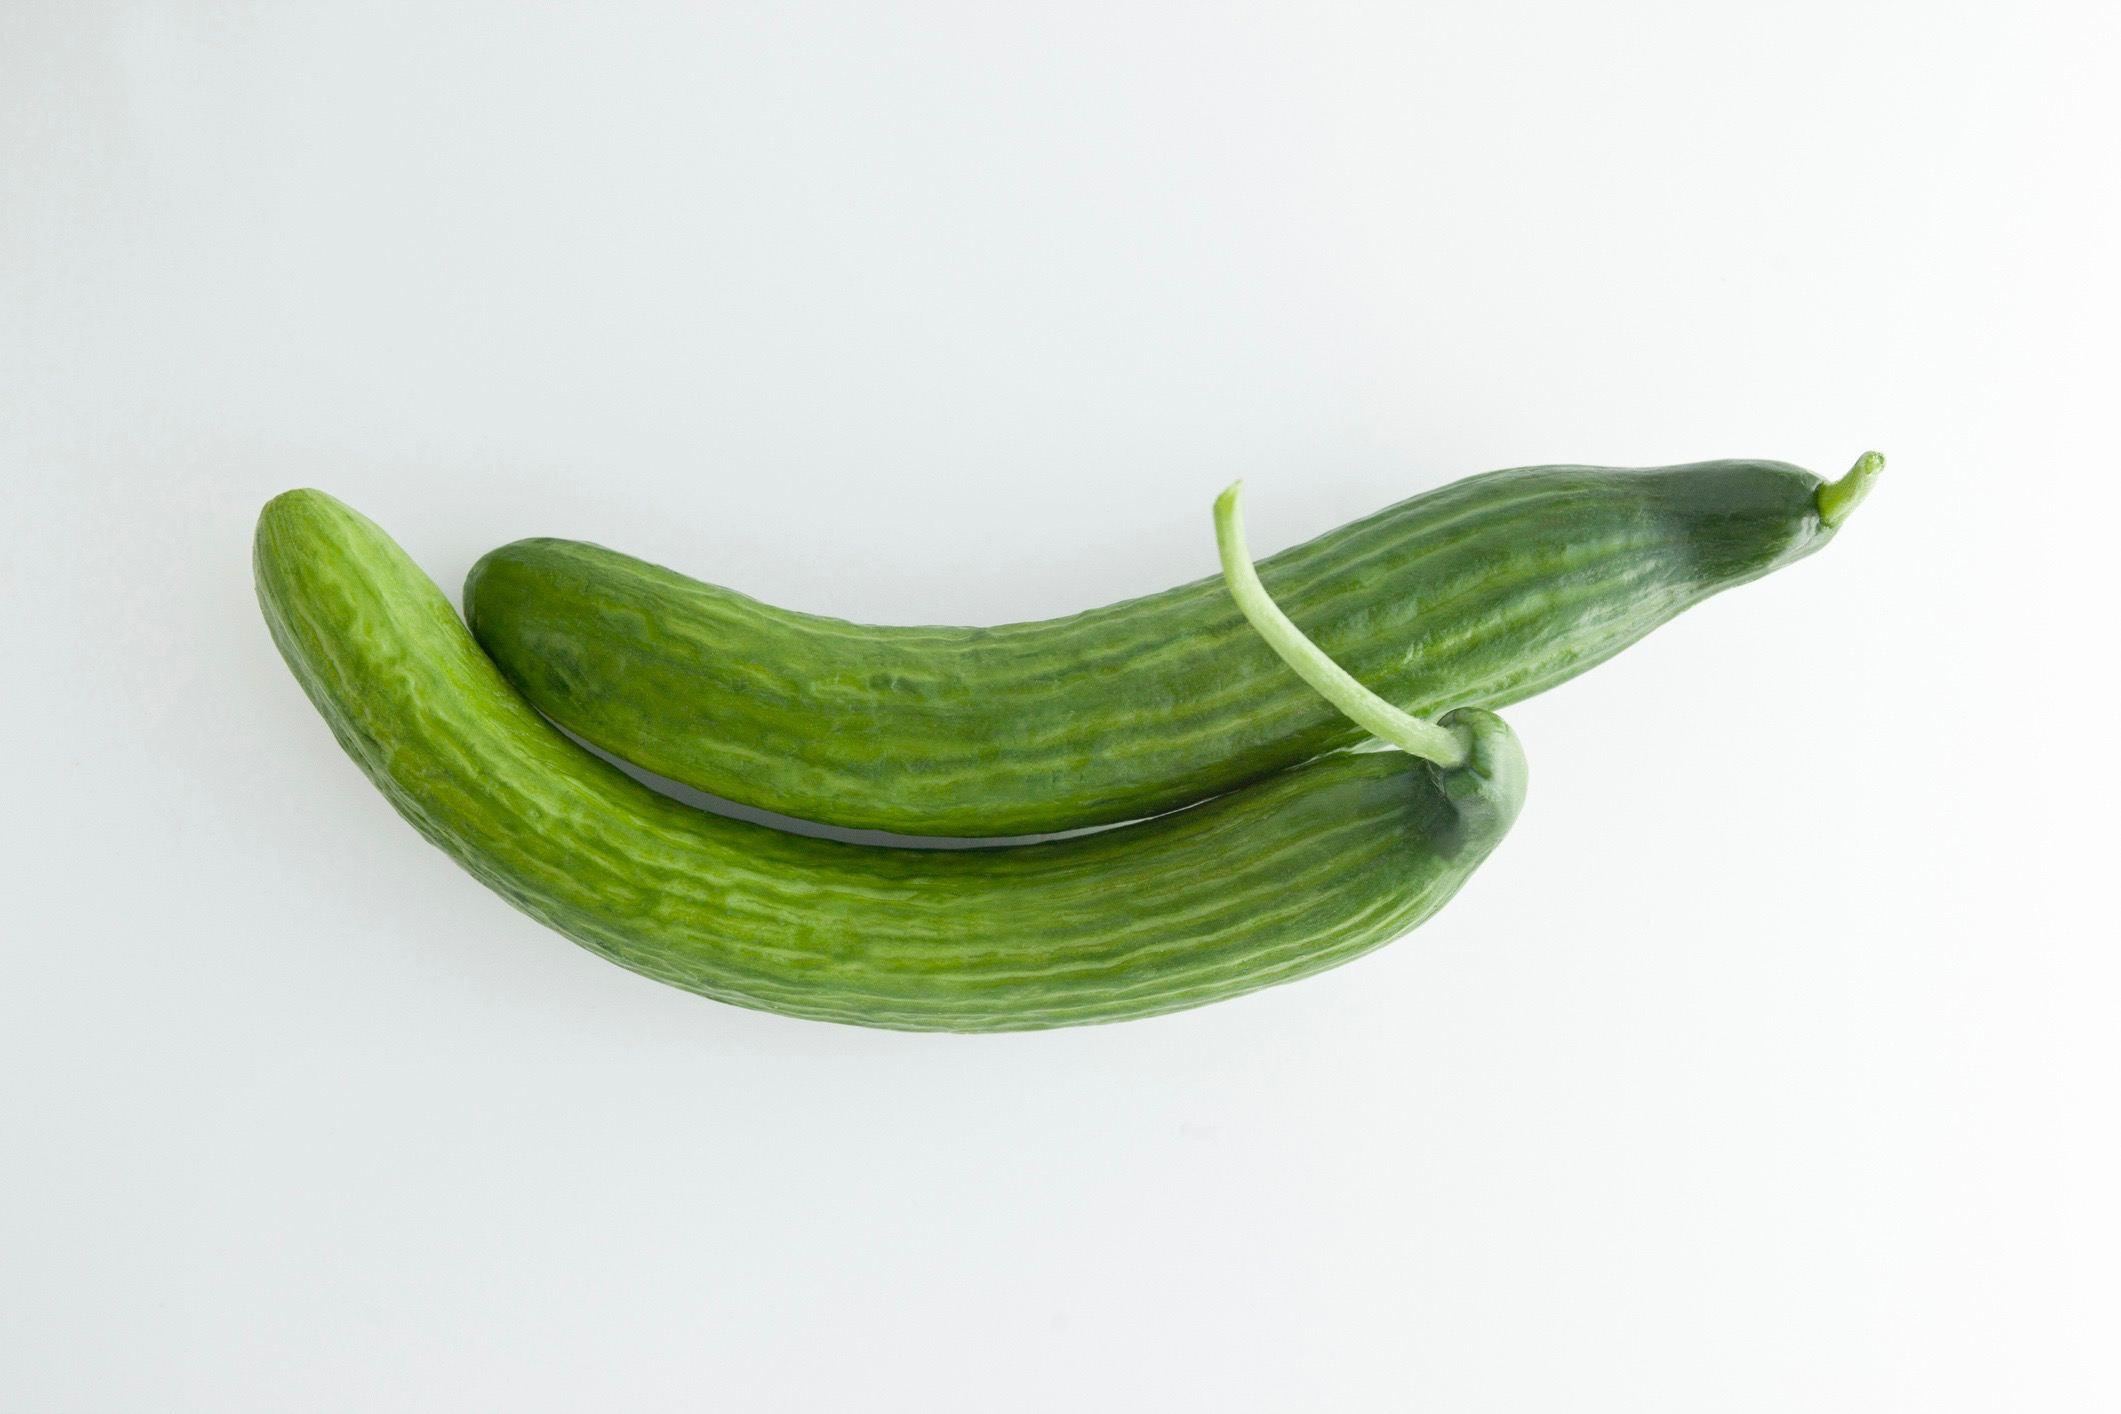 Two Long Cucumbers